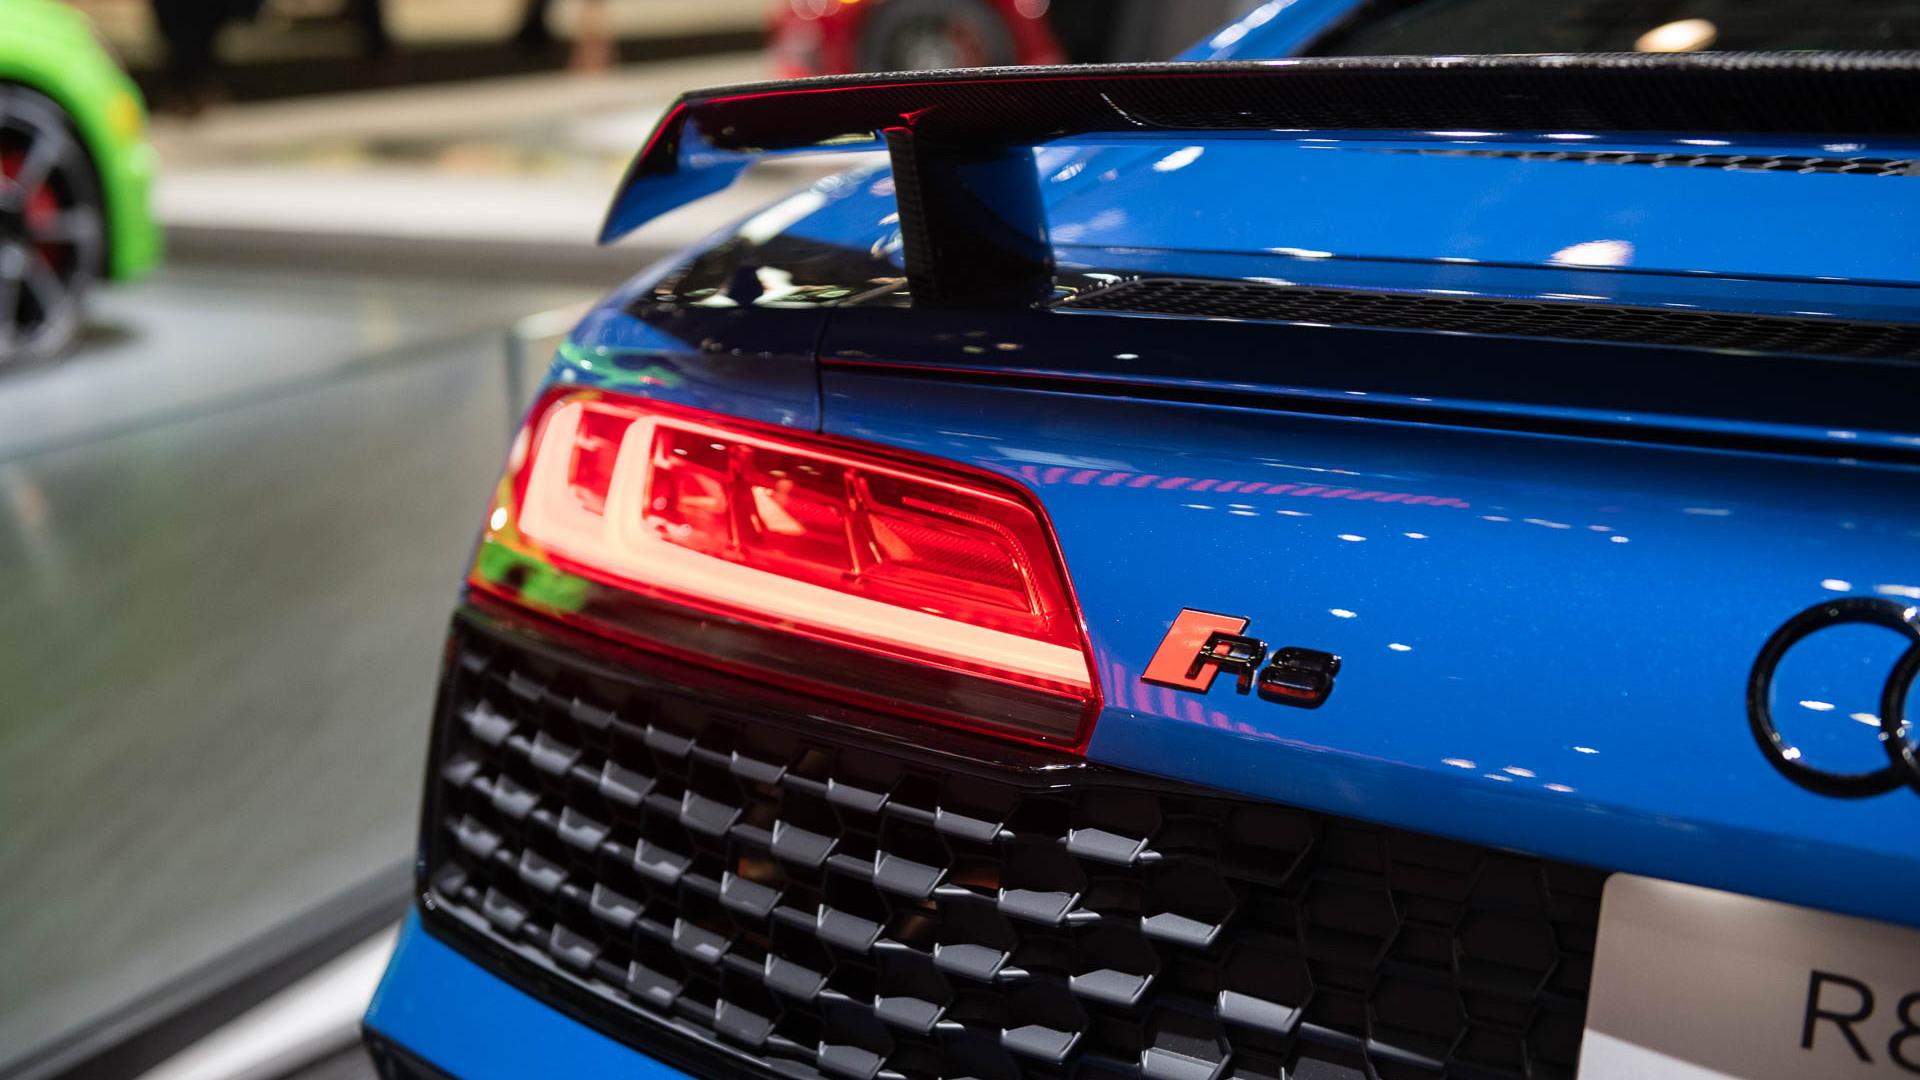 2020 Audi R8, 2019 New York International Auto Show